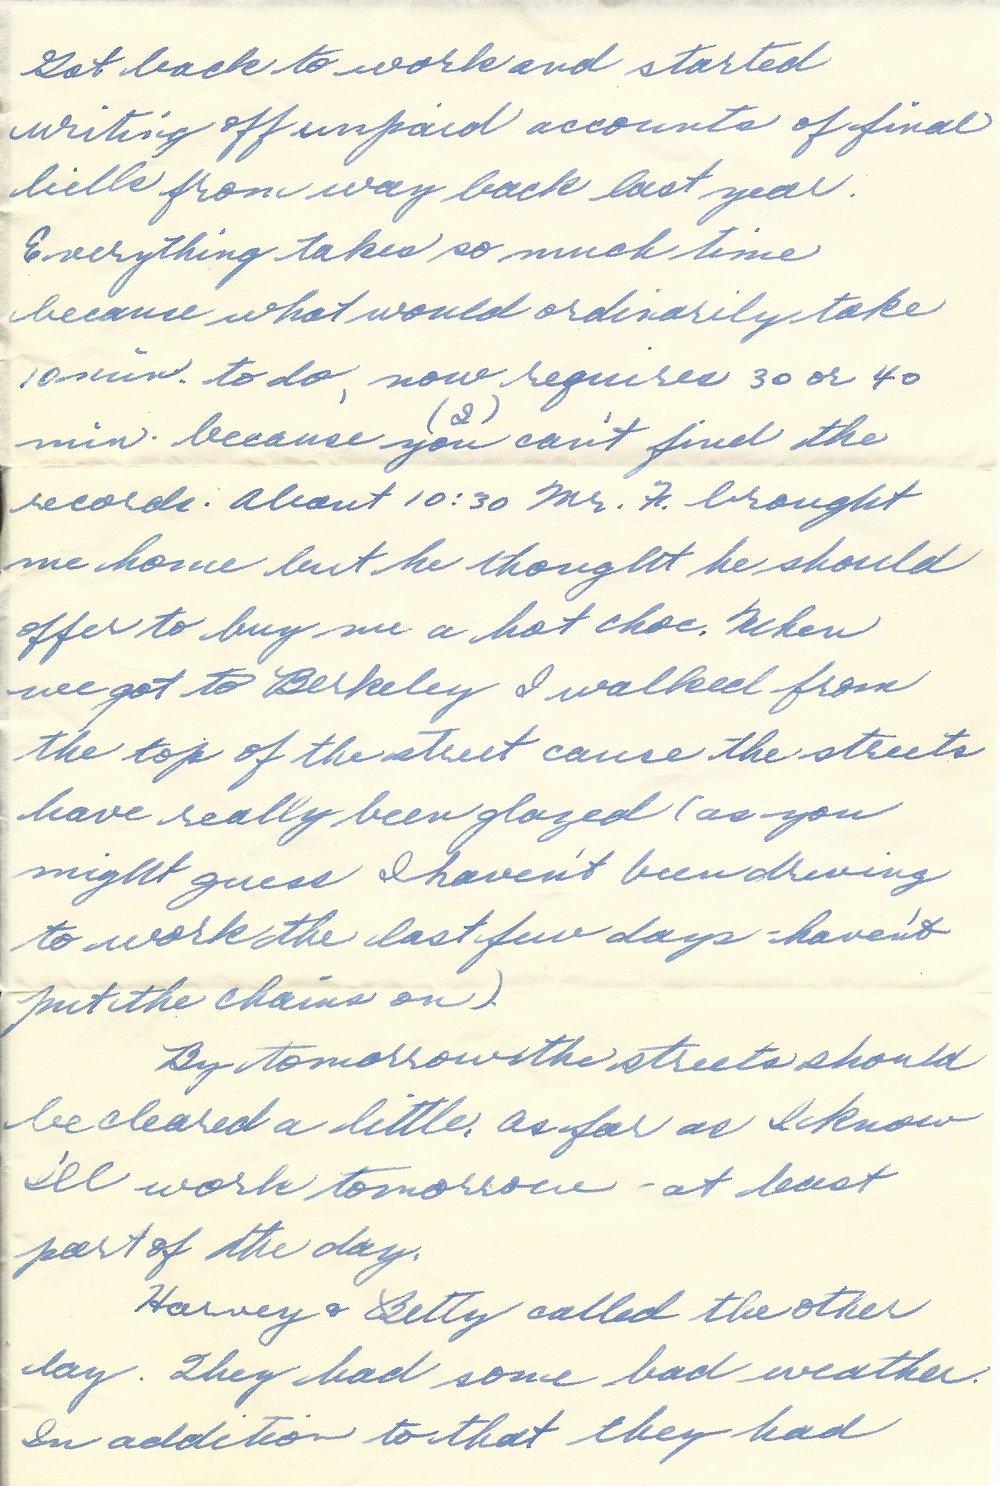 4. Jan. 9, 1953 (Oma)_Page_3.jpg